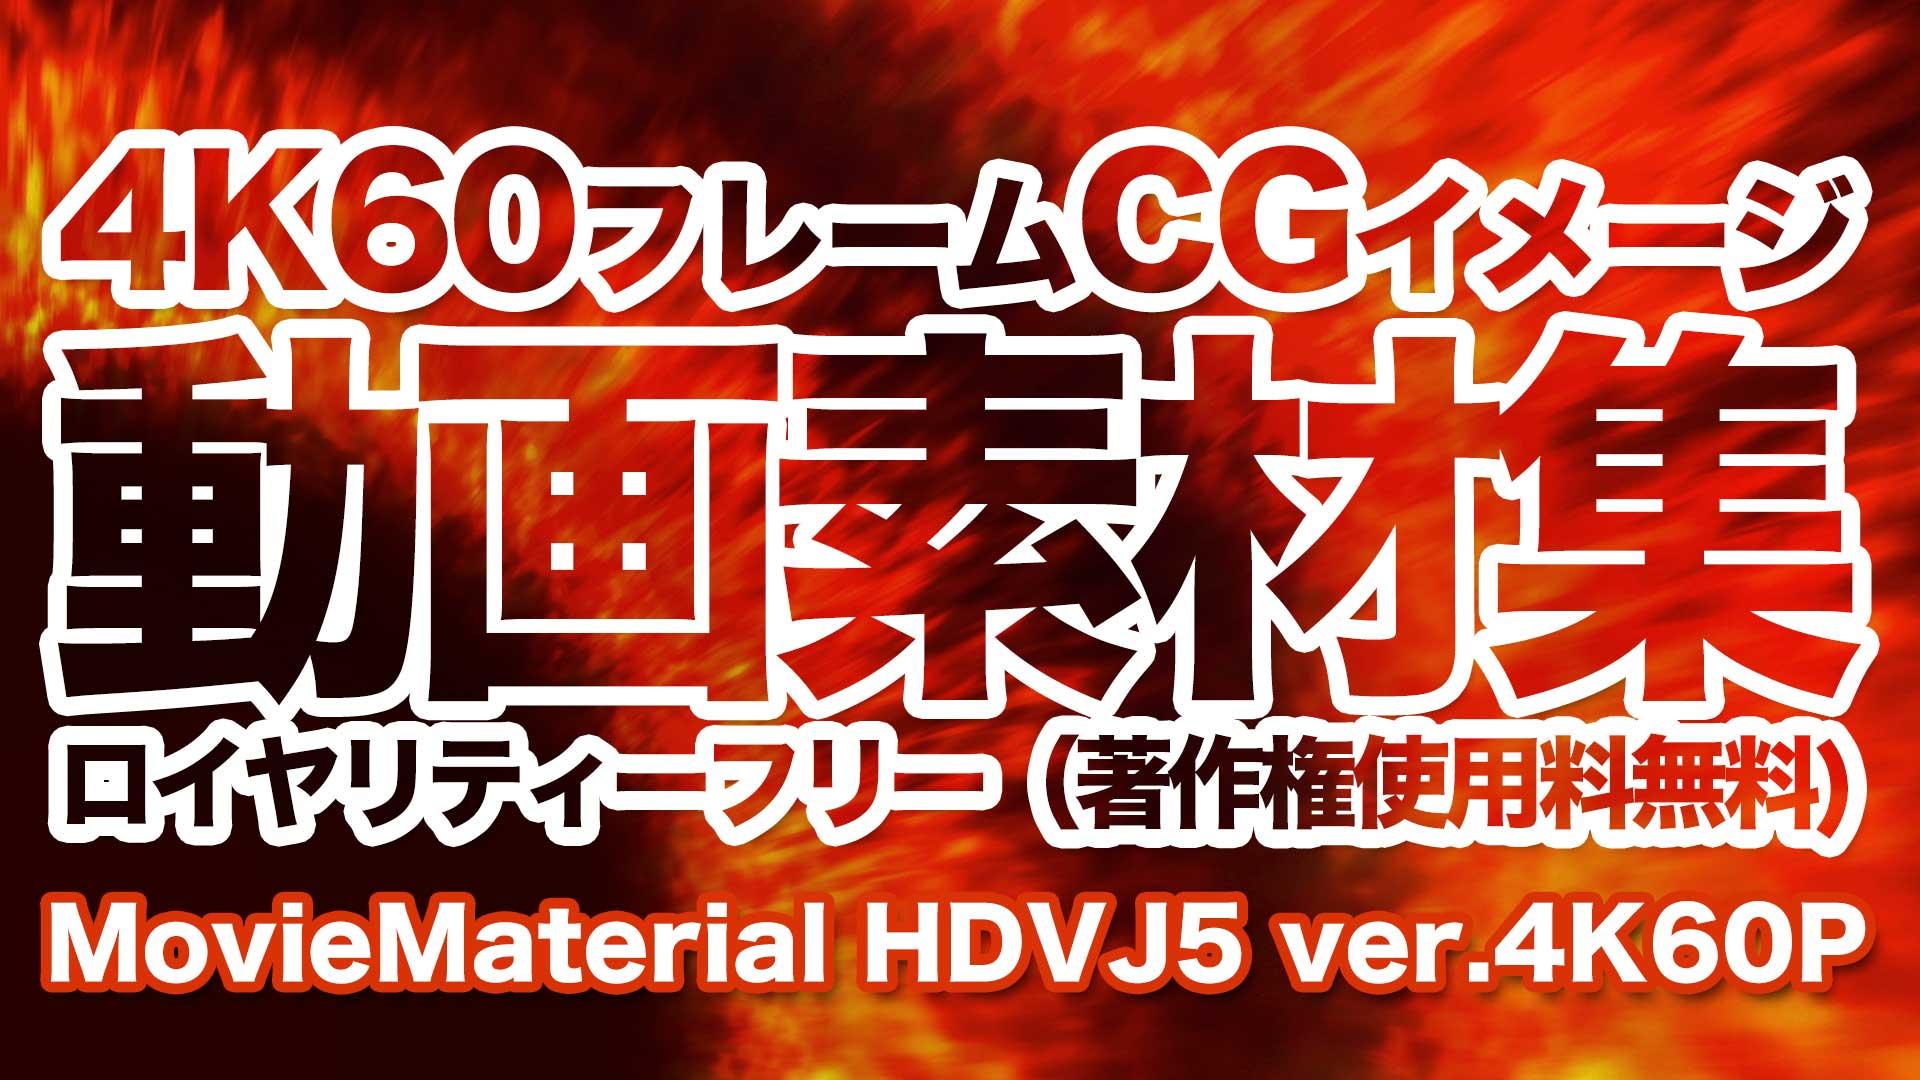 【MovieMaterial HDVJ5 Ver.4K60P】